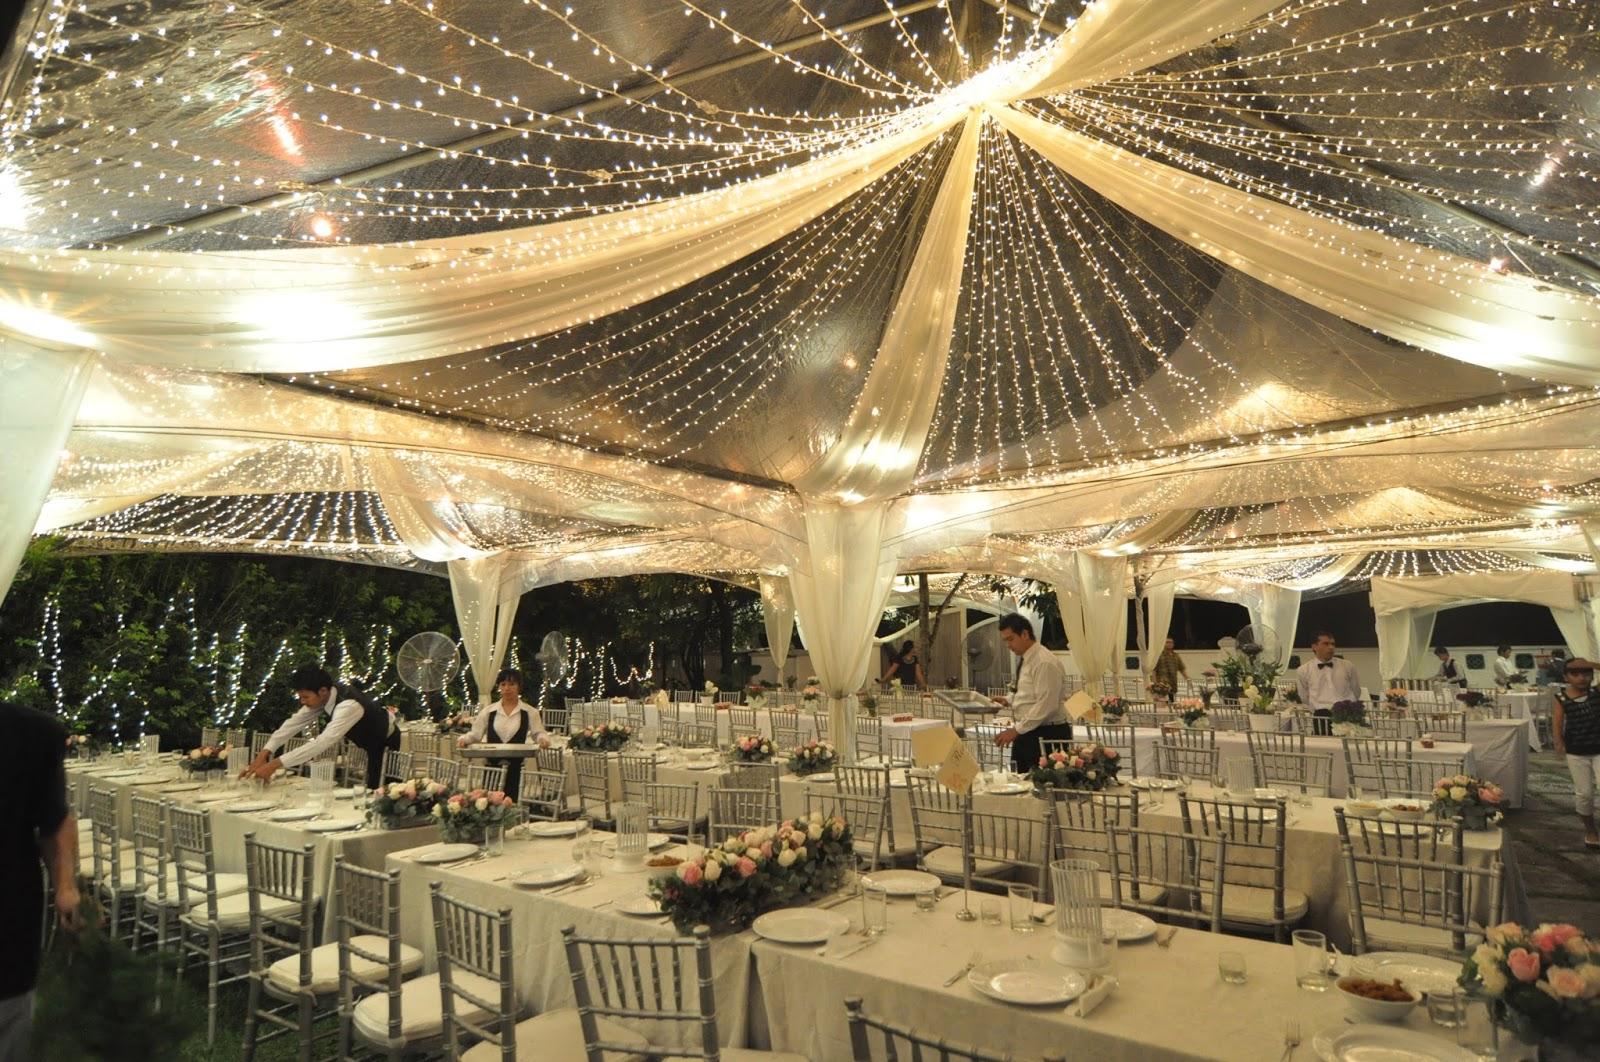 Twinkle Tent & Twinkle Tent - Todayu0027s Weddings